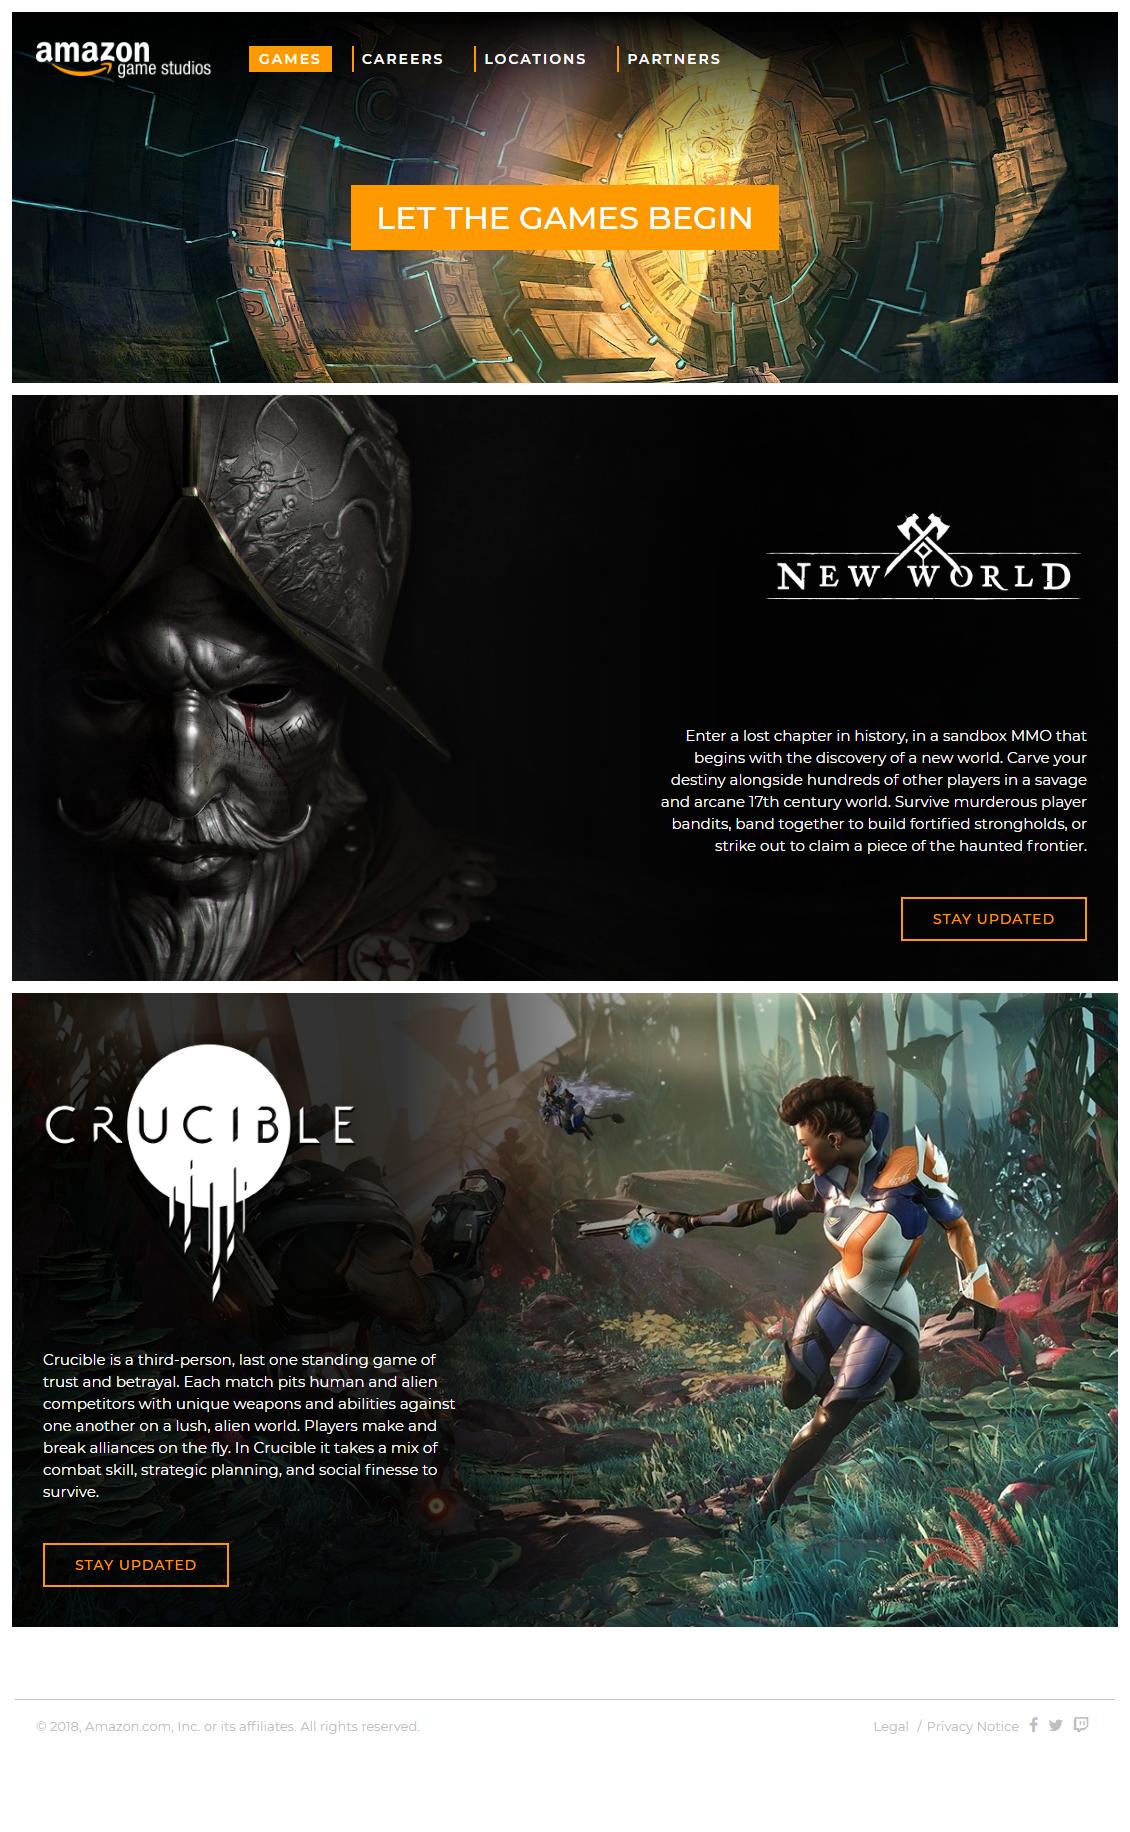 website design game amazon game studios